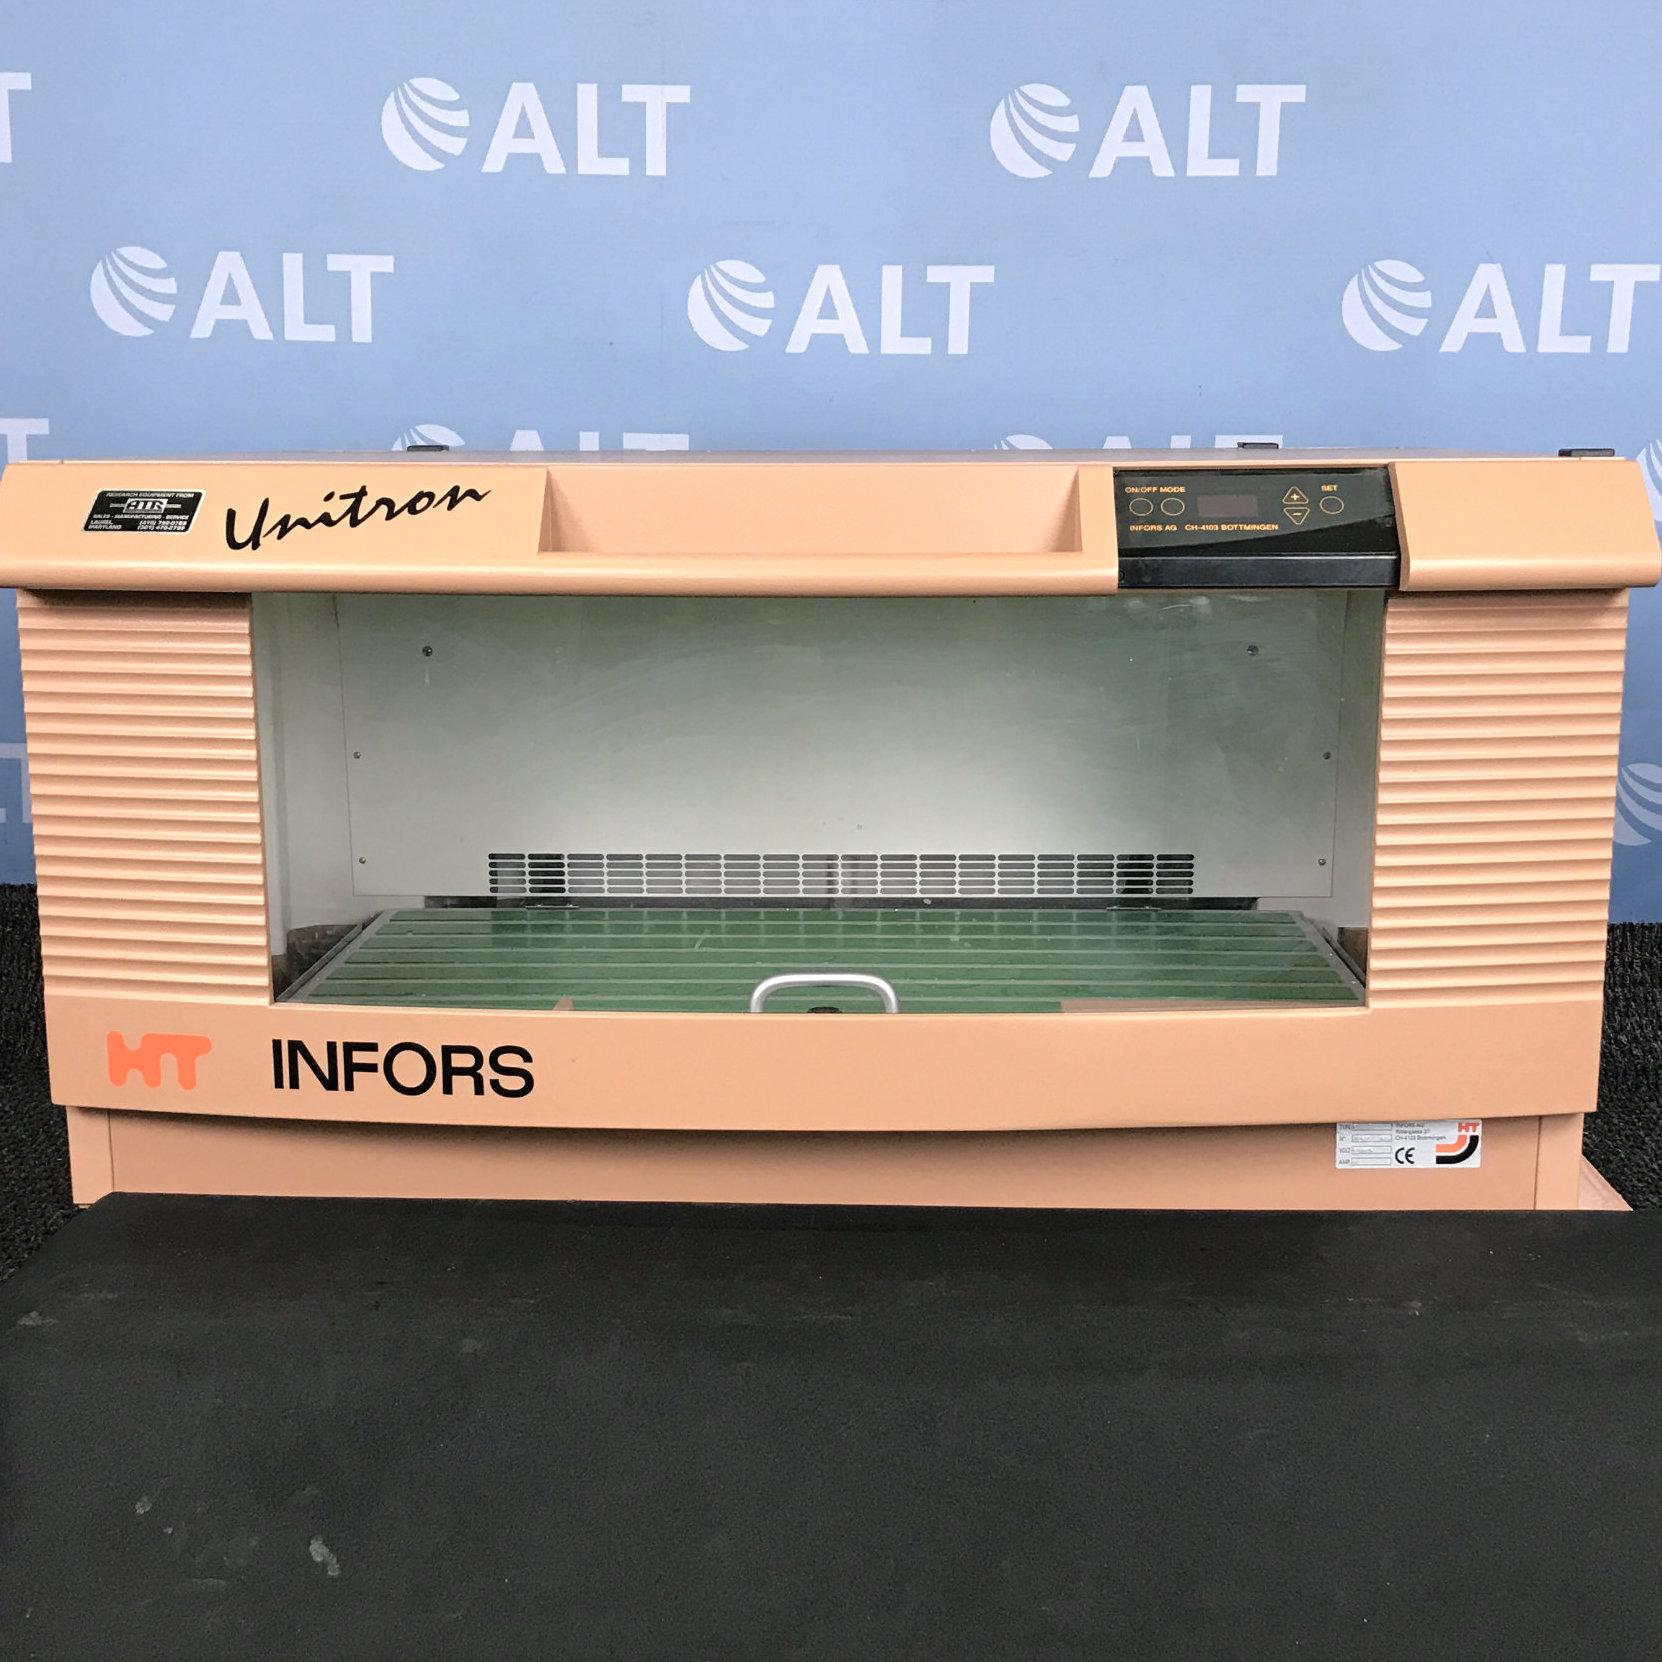 Infors HT 1300002 Unitron Incubator Shaker Image